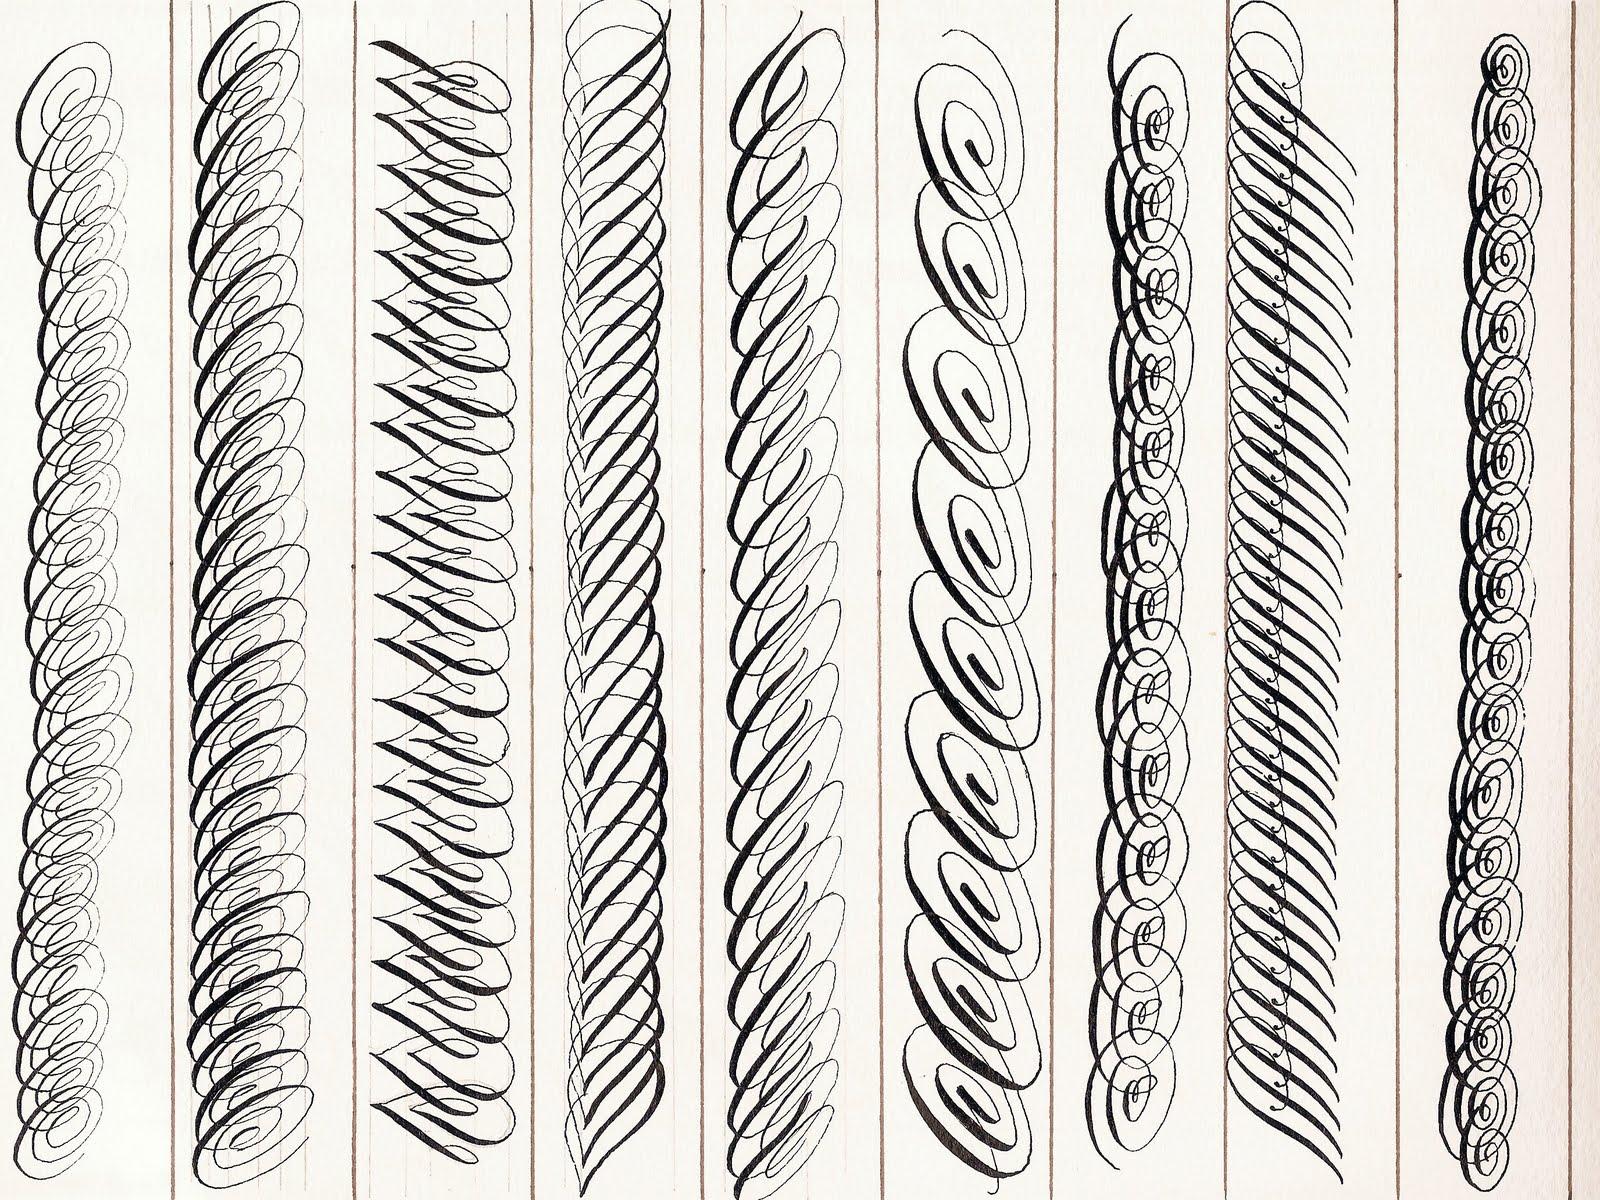 Ejercicios archivos la caligraf a Yukimi annand calligraphy